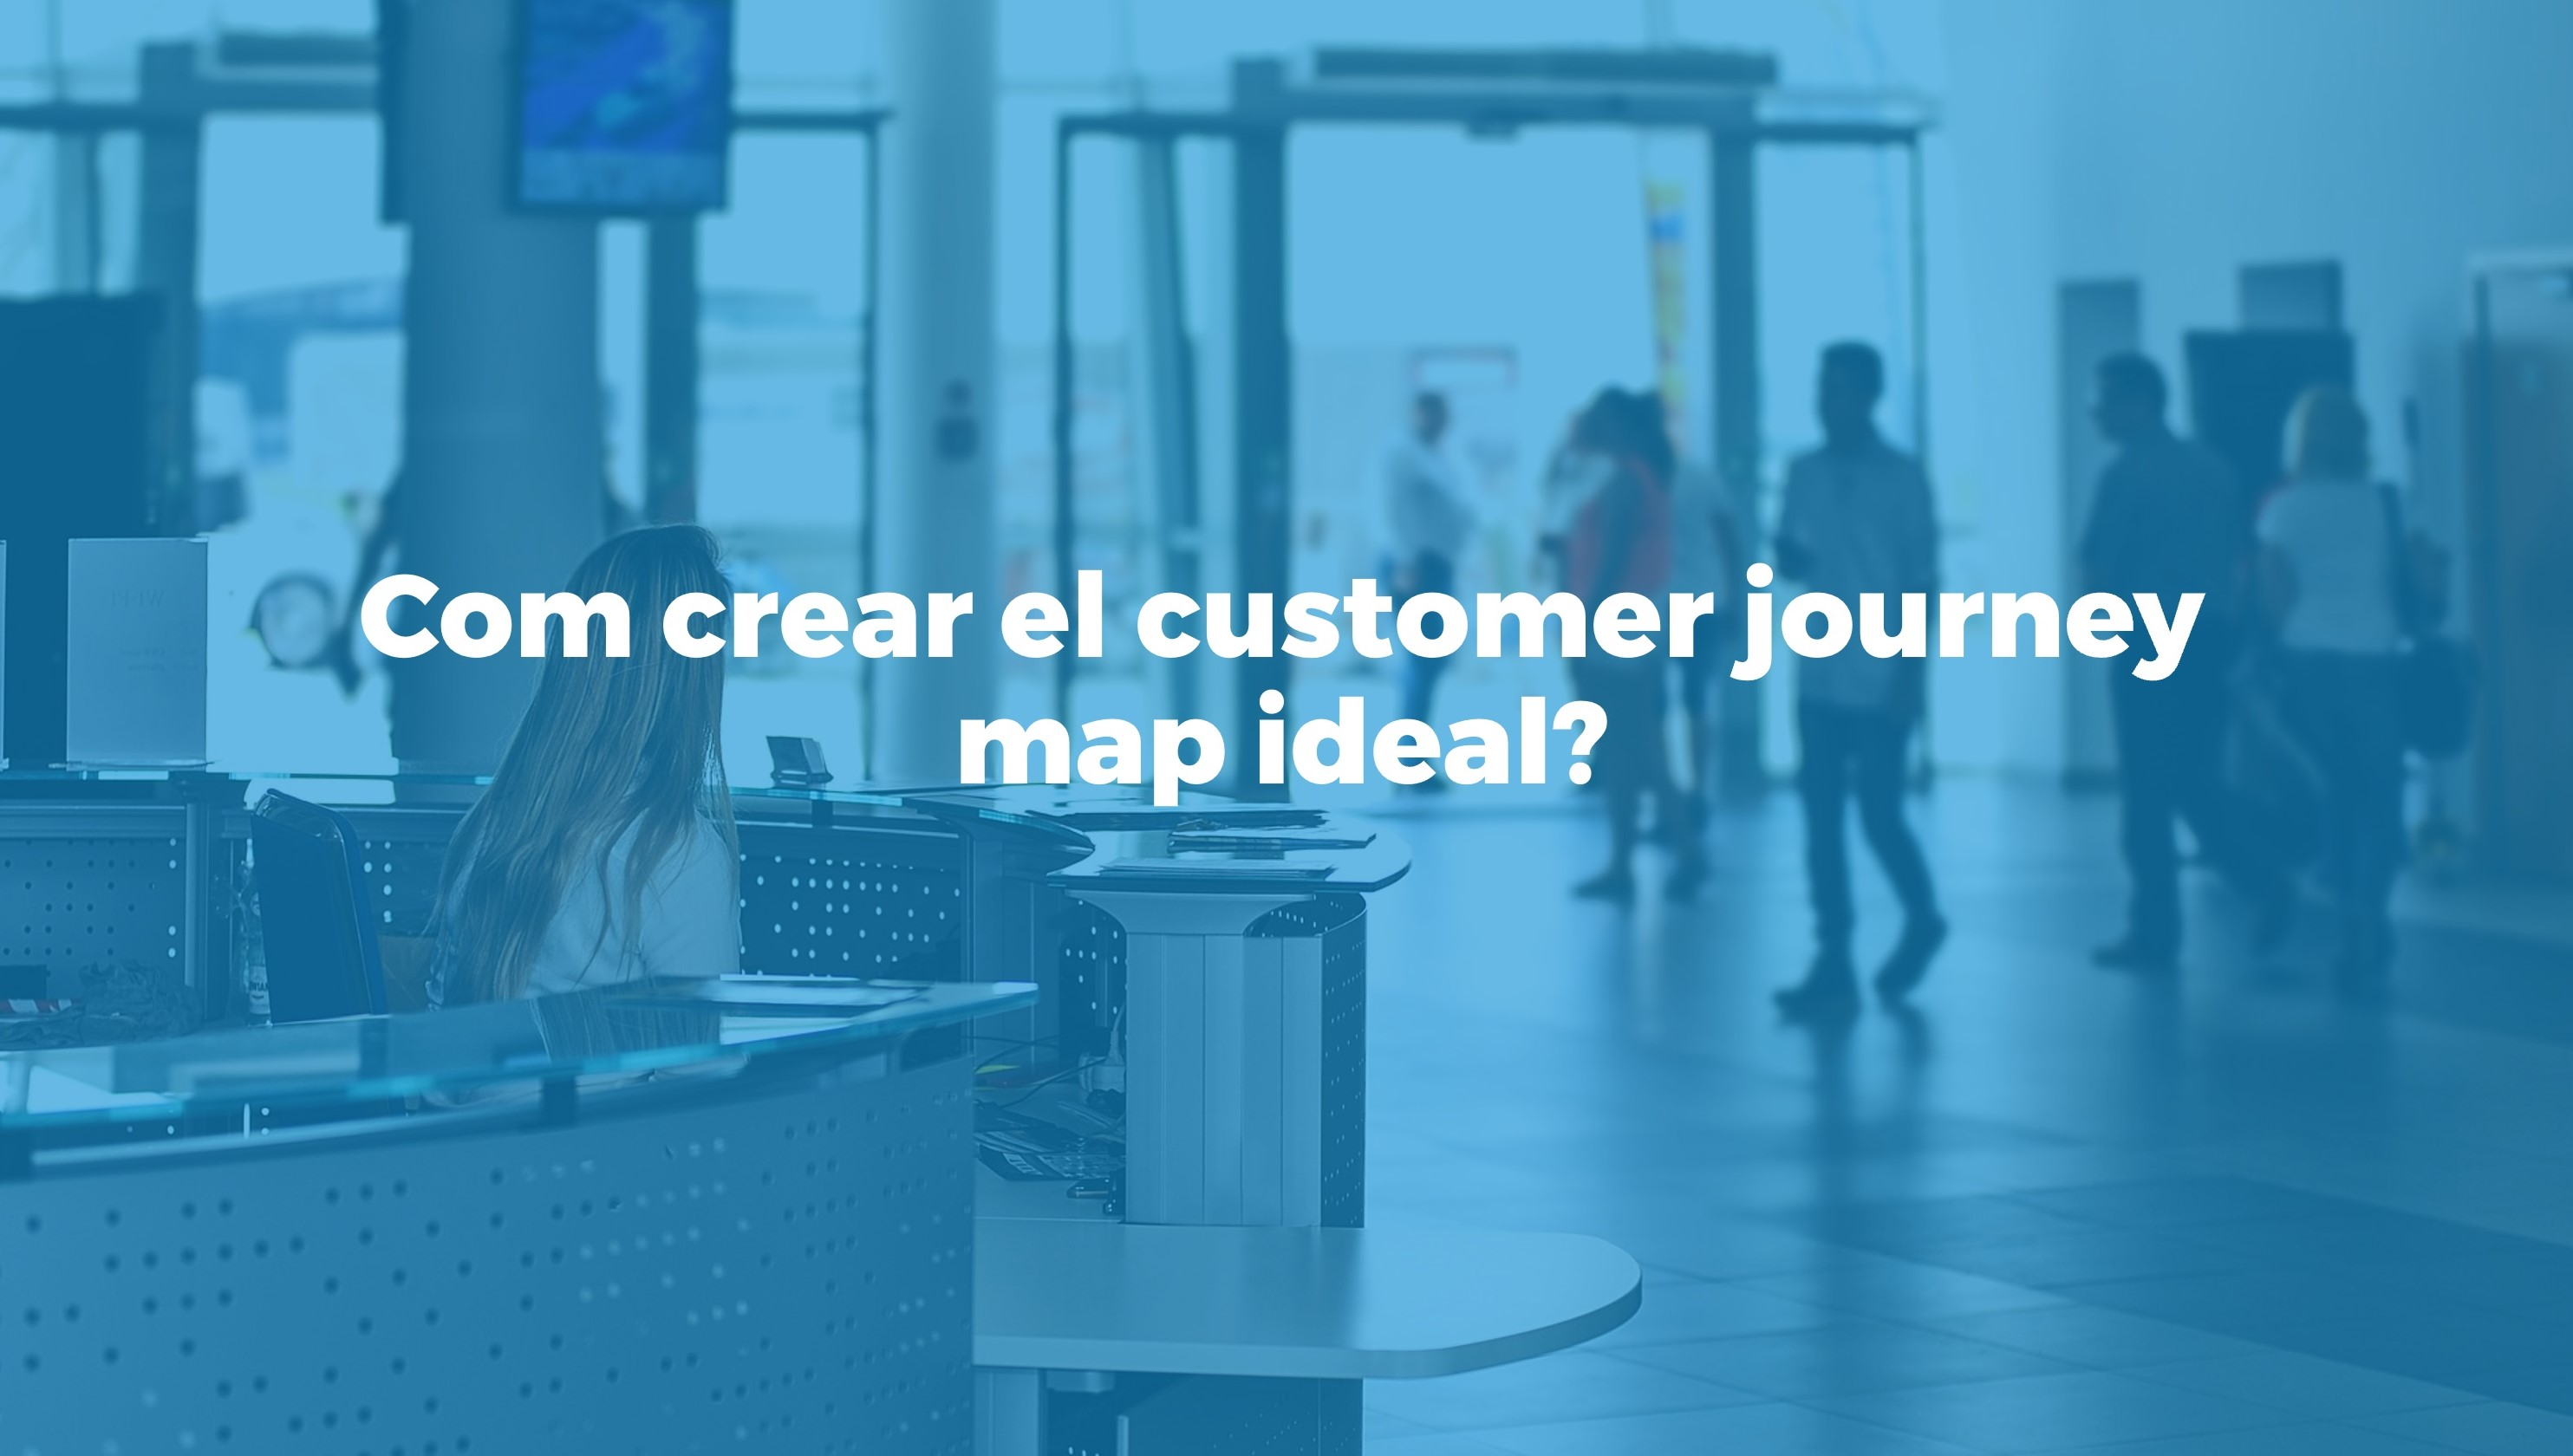 com crear el customer journey map ideal